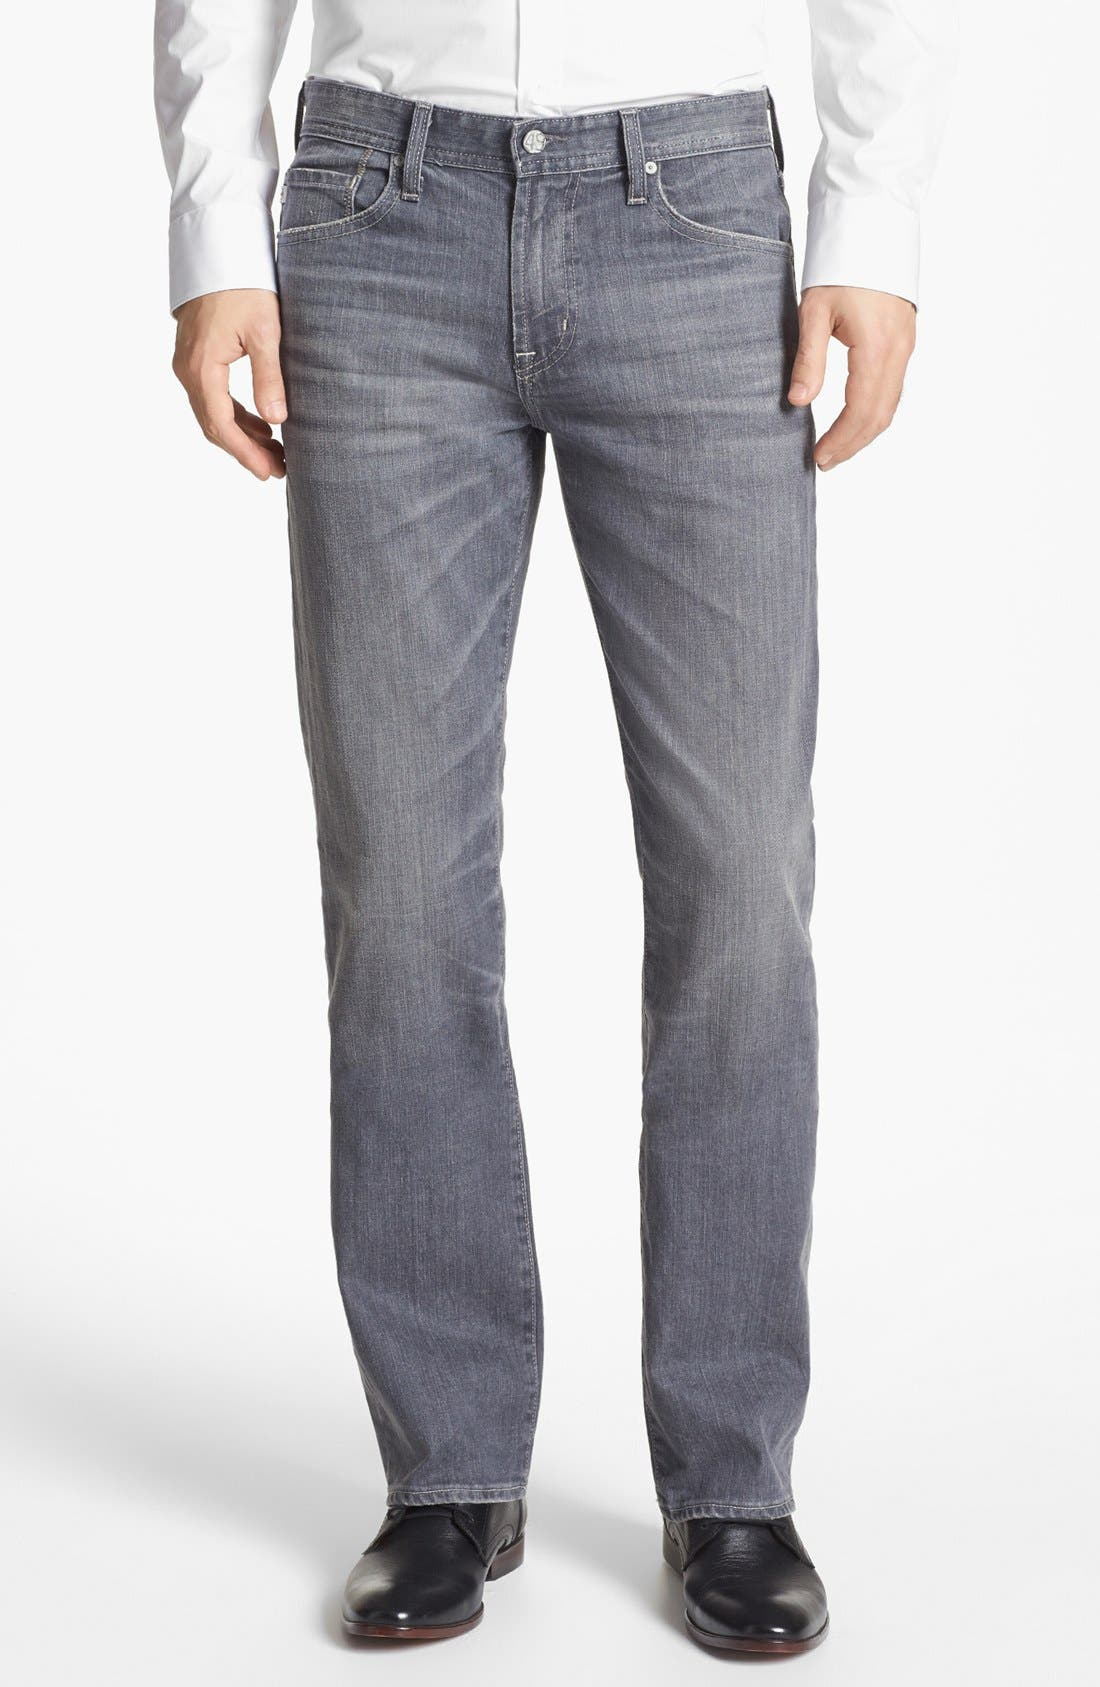 Alternate Image 1 Selected - AG 'Protégé' Straight Leg Jeans (9 Years Grey)